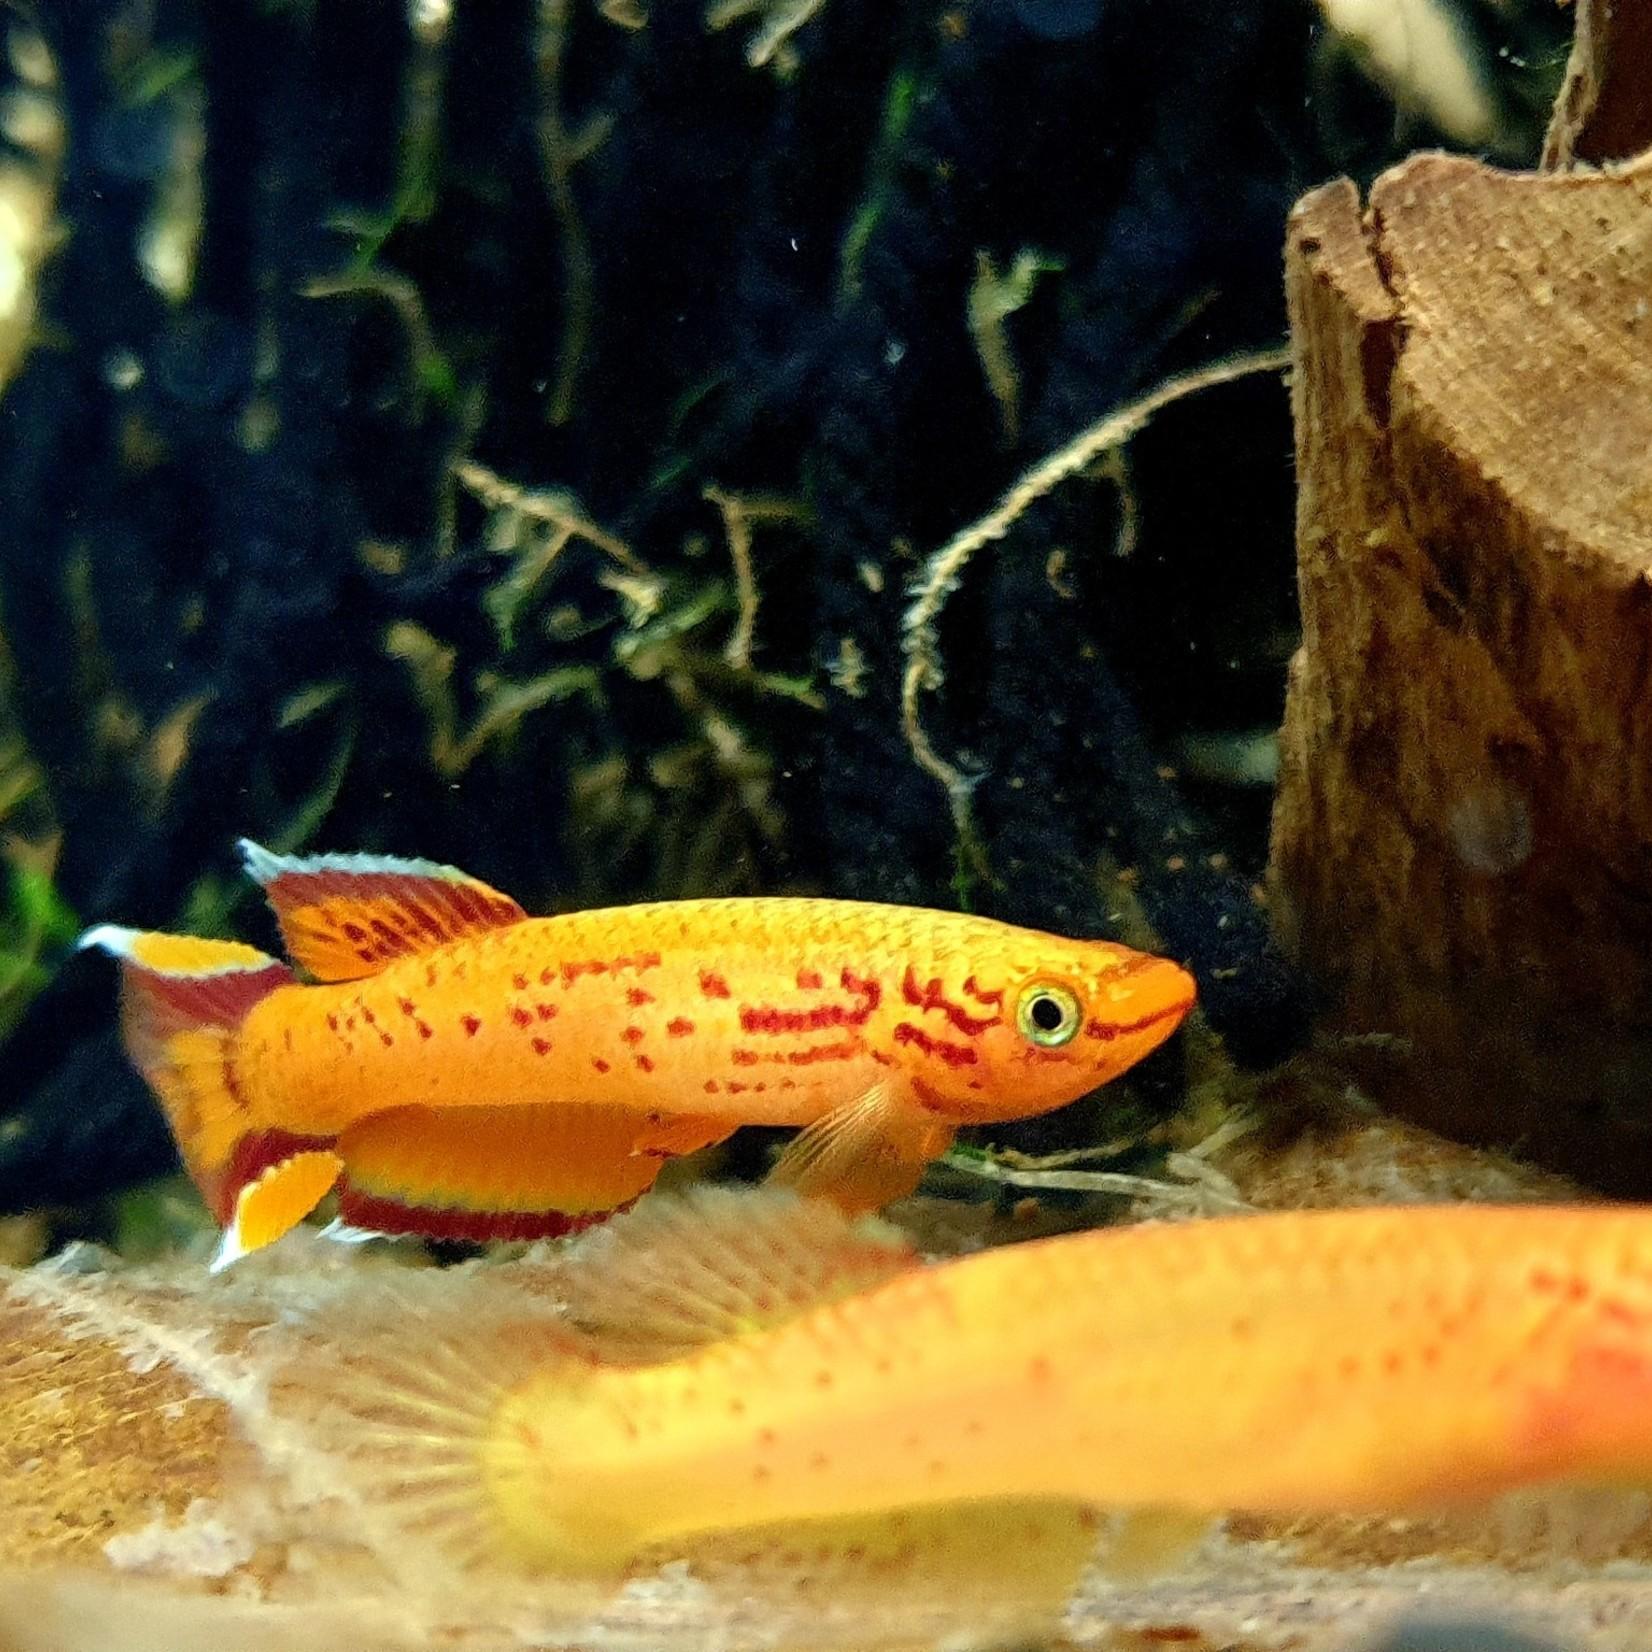 Bubba's Fishs Aphyosemion Australe hjersseni (gedeeltelijk)